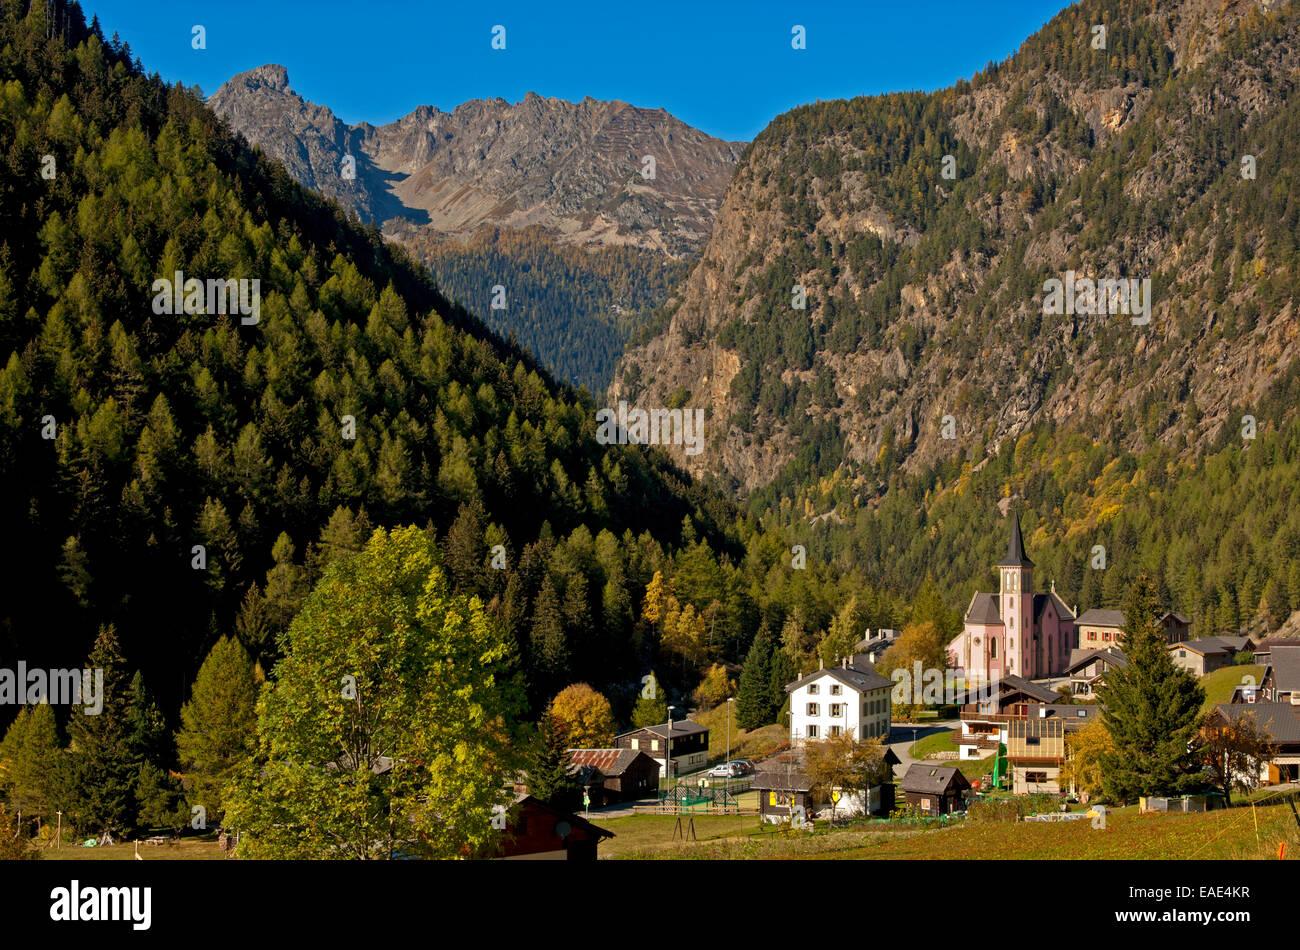 Community of Trent at La Forclaz Pass, Trient, Martigny district, Canton of Valais, Switzerland - Stock Image